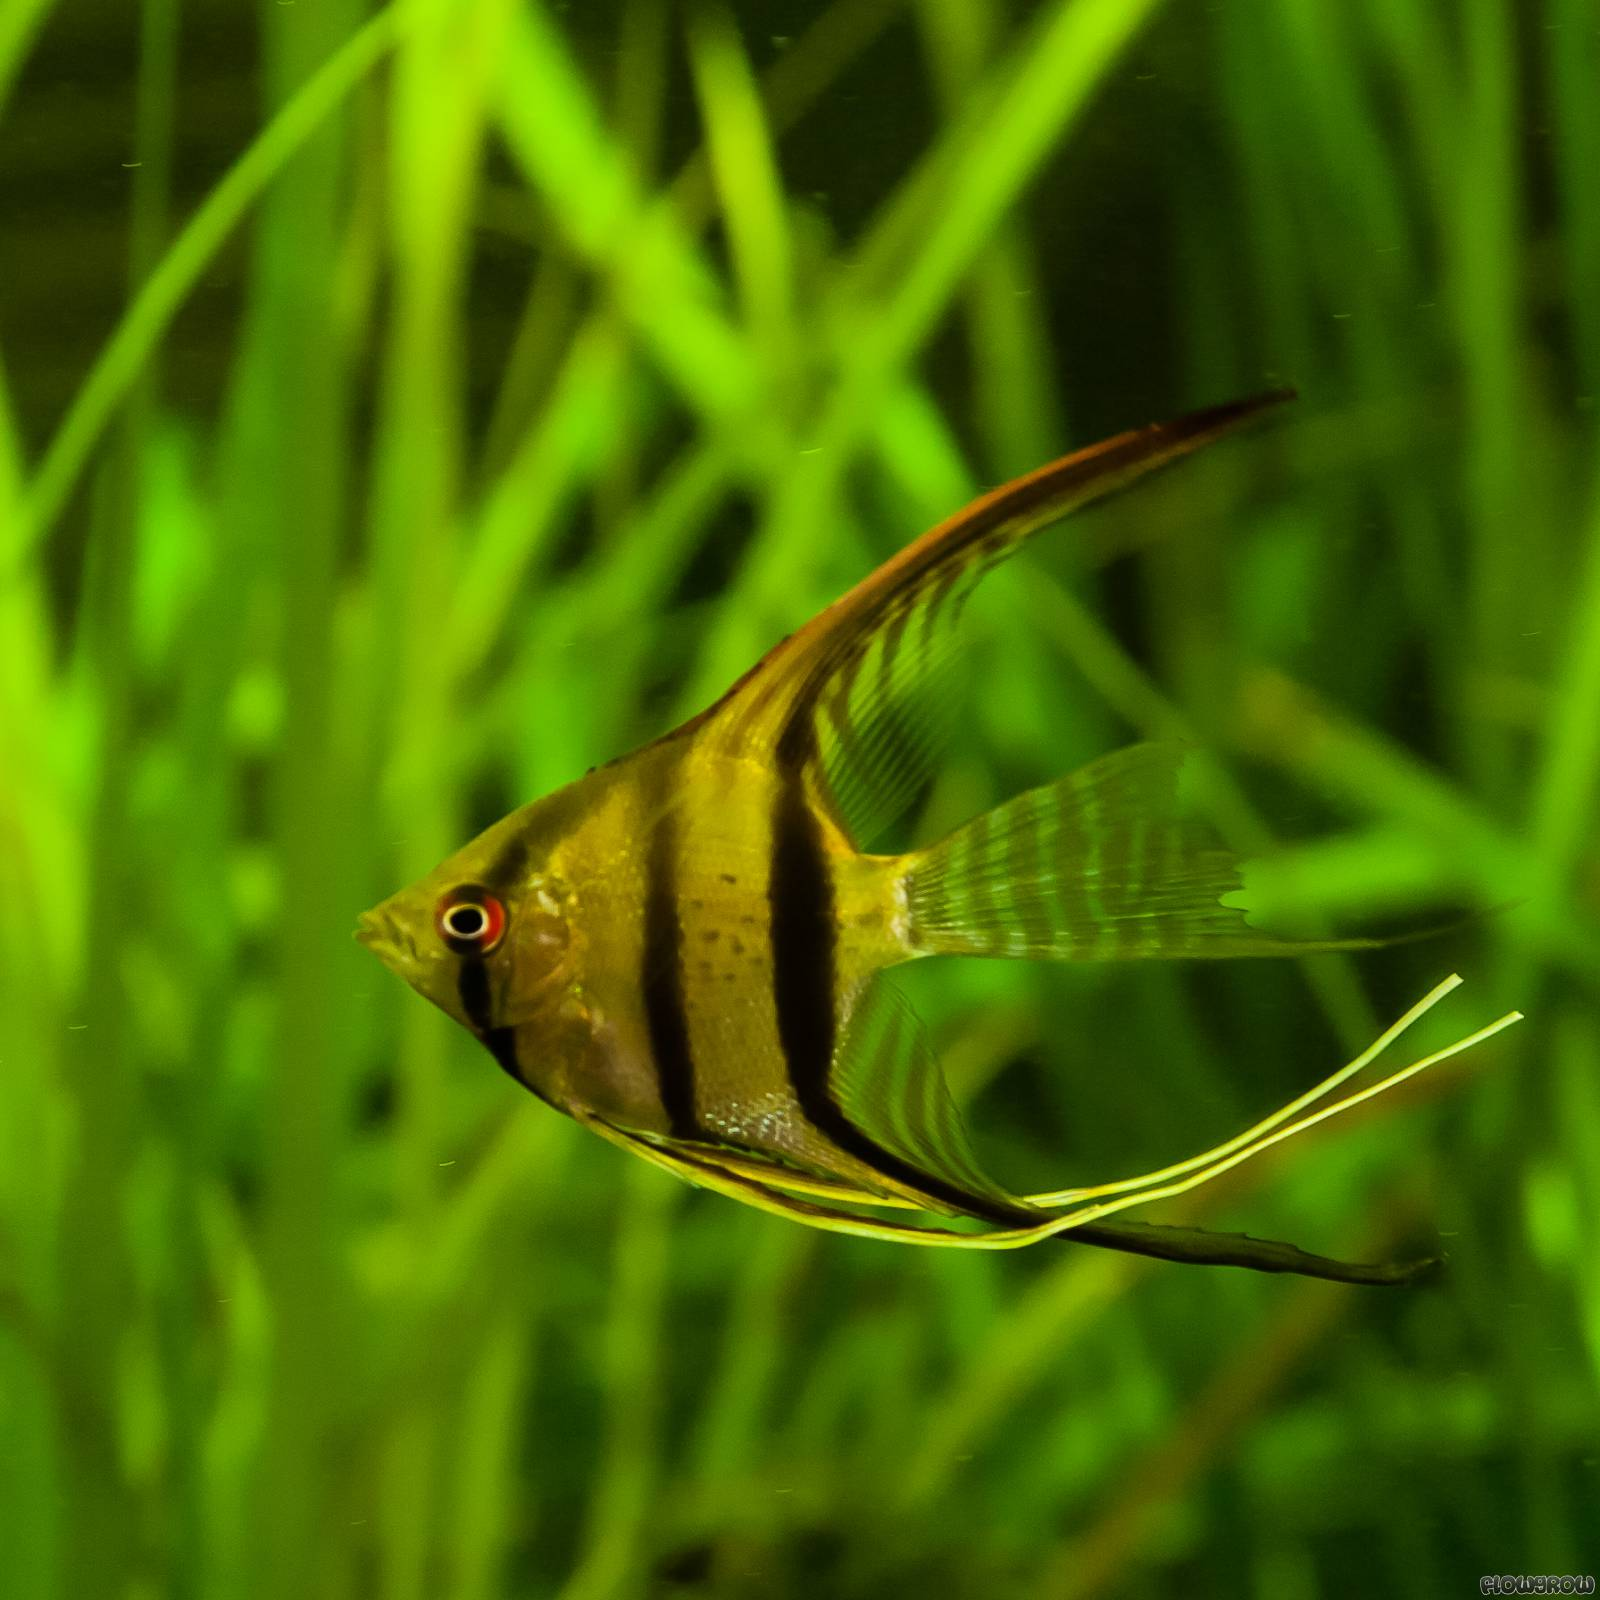 Pterophyllum scalare skalar flowgrow fisch datenbank for Peru altum skalar